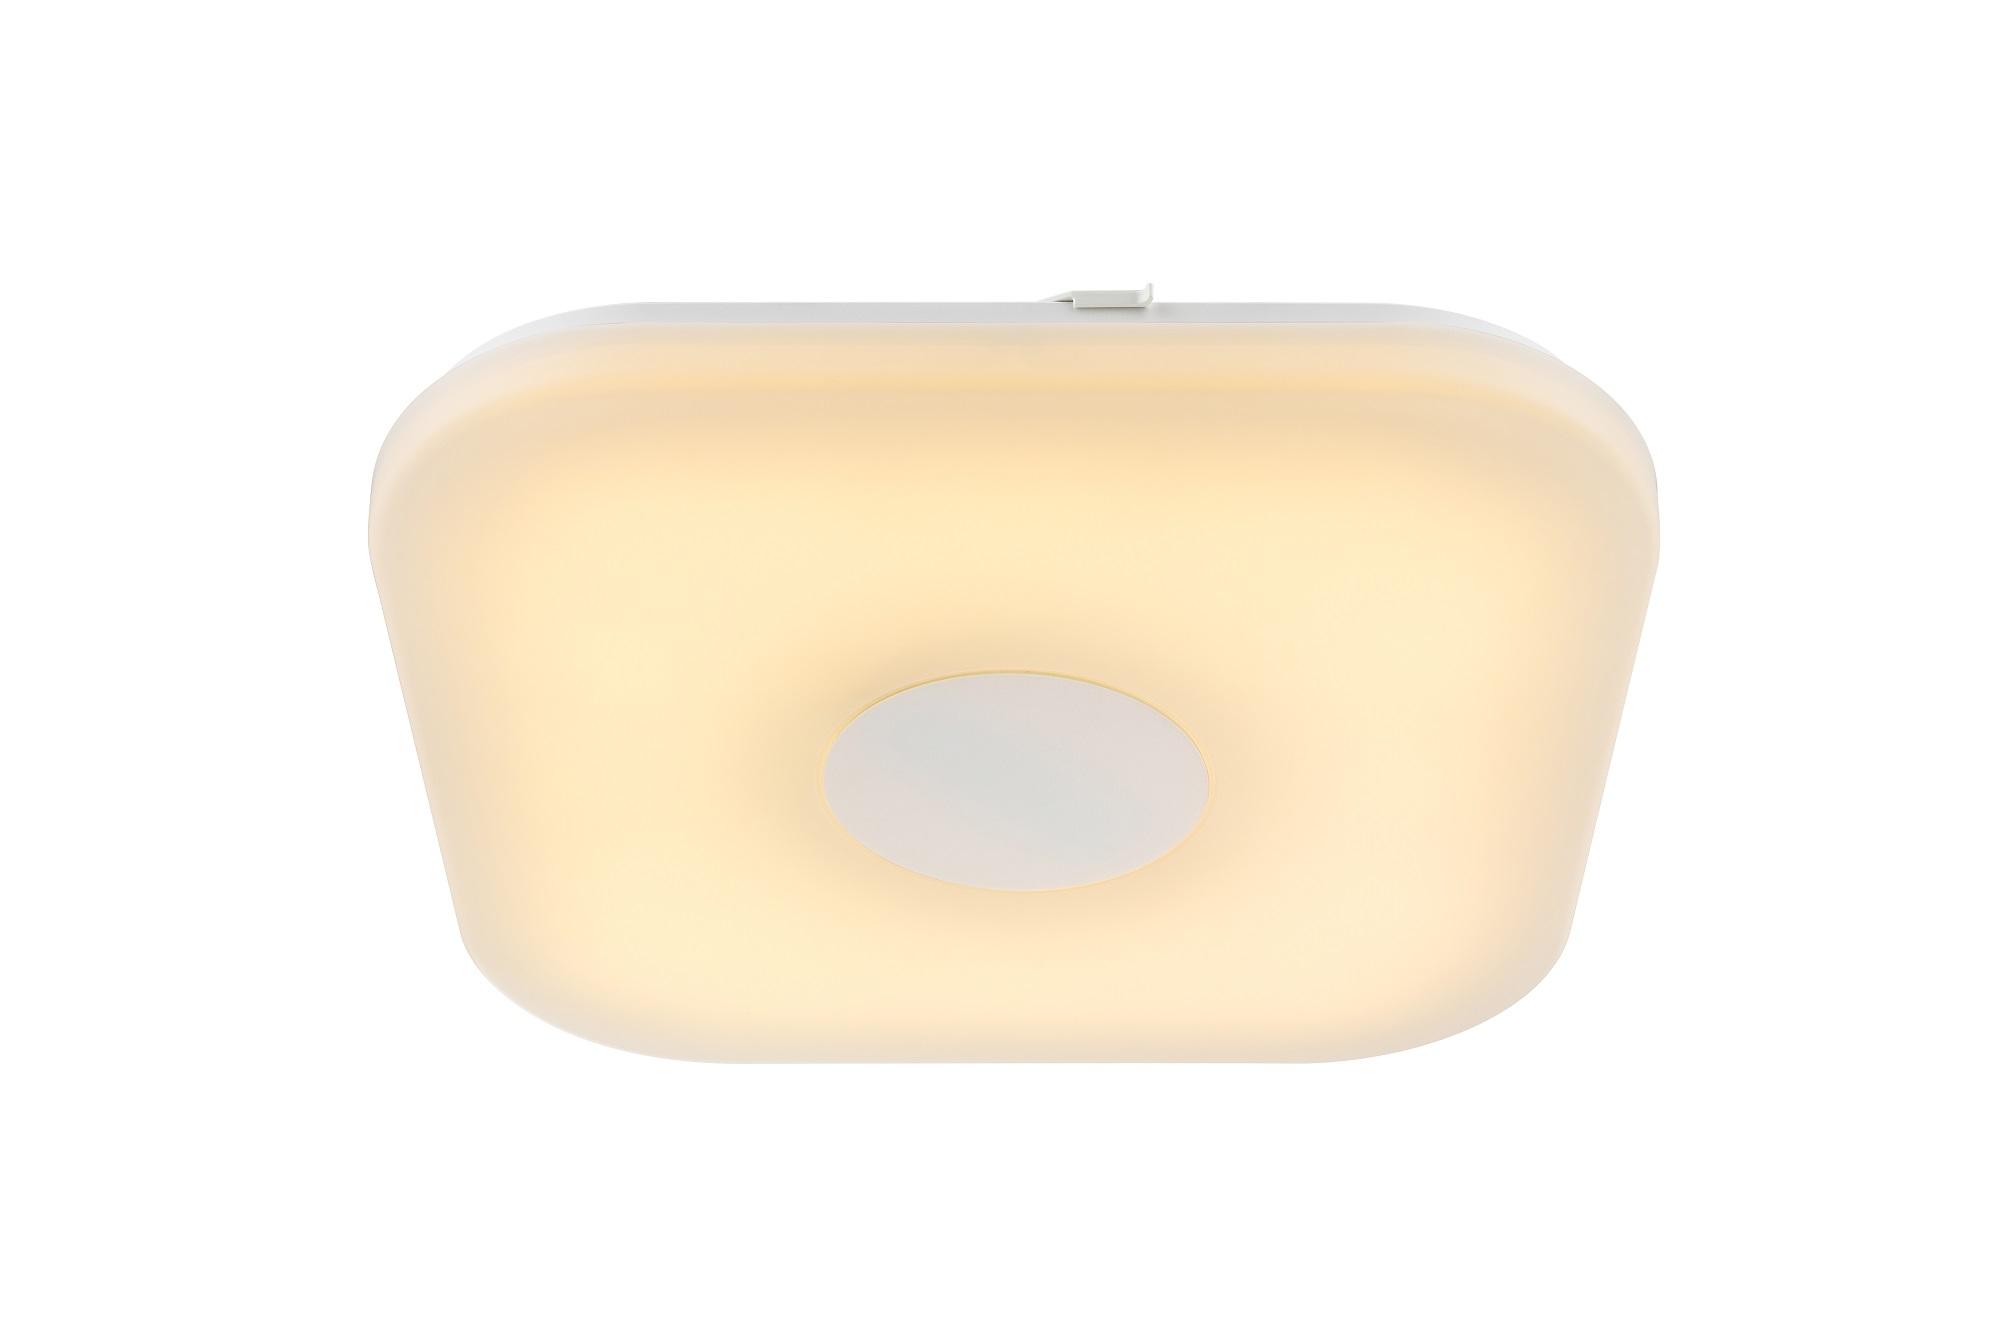 Светильник настенно-потолочныйПотолочные светильники<br>&amp;lt;div&amp;gt;Вид цоколя: LED&amp;lt;/div&amp;gt;&amp;lt;div&amp;gt;Мощность: 15W&amp;lt;/div&amp;gt;&amp;lt;div&amp;gt;Количество ламп: 1&amp;lt;/div&amp;gt;&amp;lt;div&amp;gt;&amp;lt;br&amp;gt;&amp;lt;/div&amp;gt;&amp;lt;div&amp;gt;Материал: металл, акрил&amp;lt;/div&amp;gt;<br><br>Material: Металл<br>Width см: 36<br>Depth см: 36<br>Height см: 5